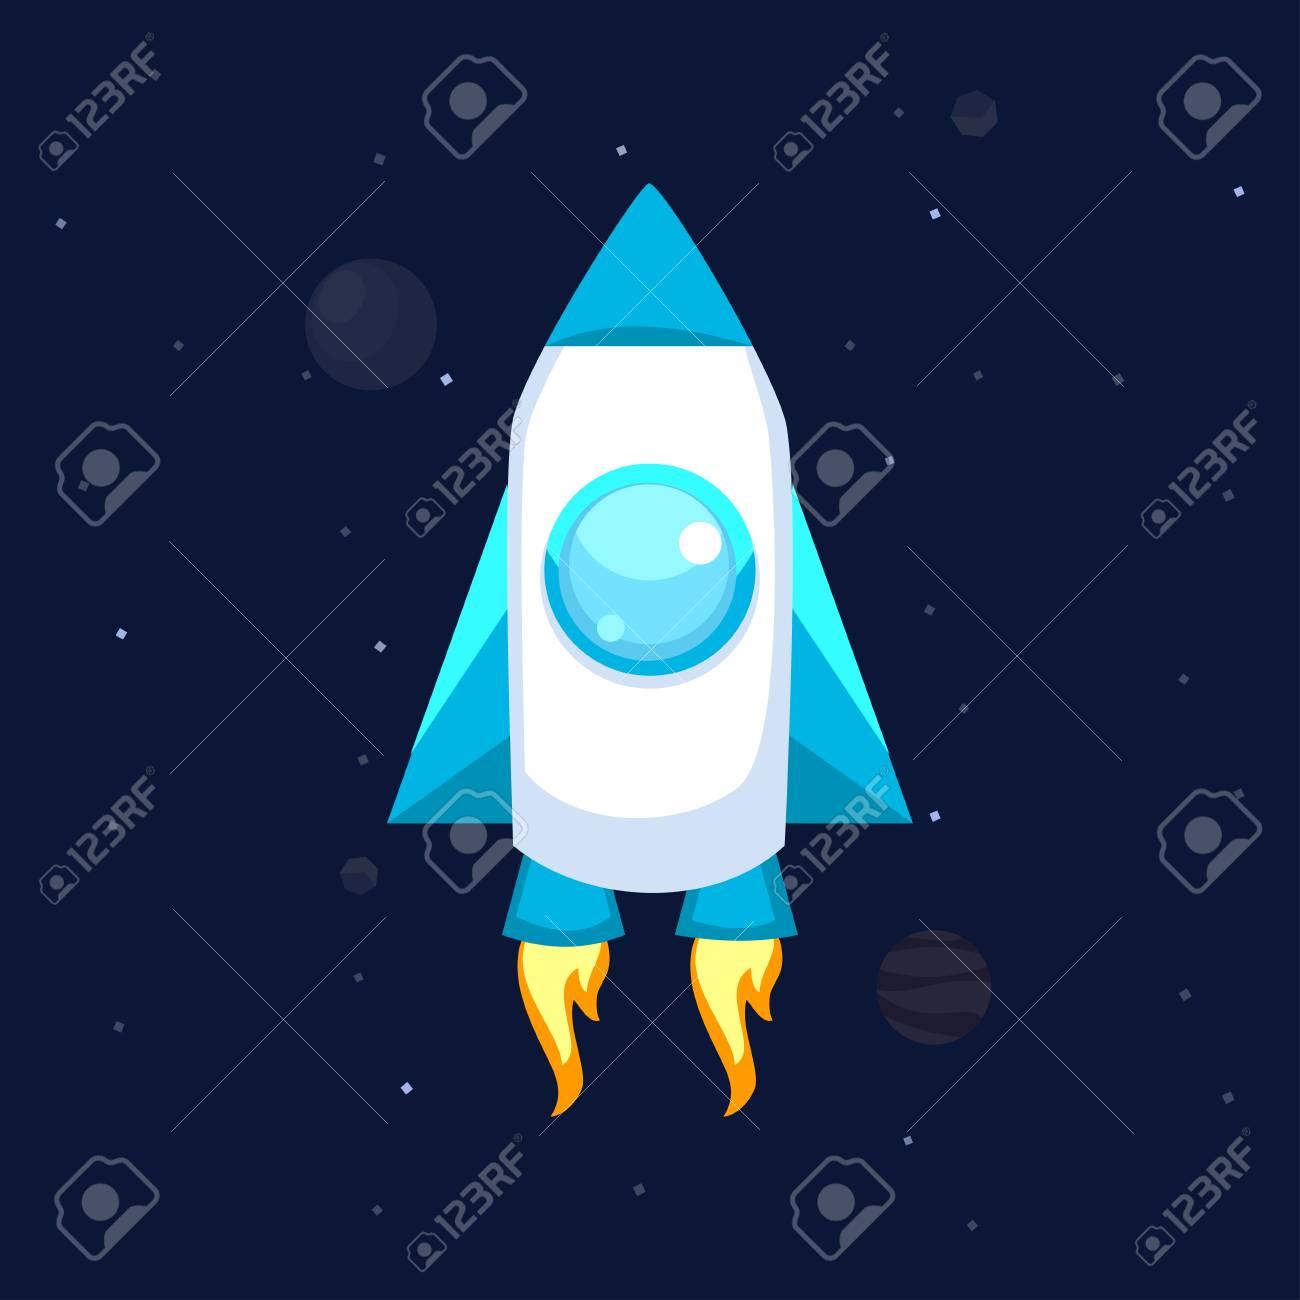 Rocket icons - 69017553